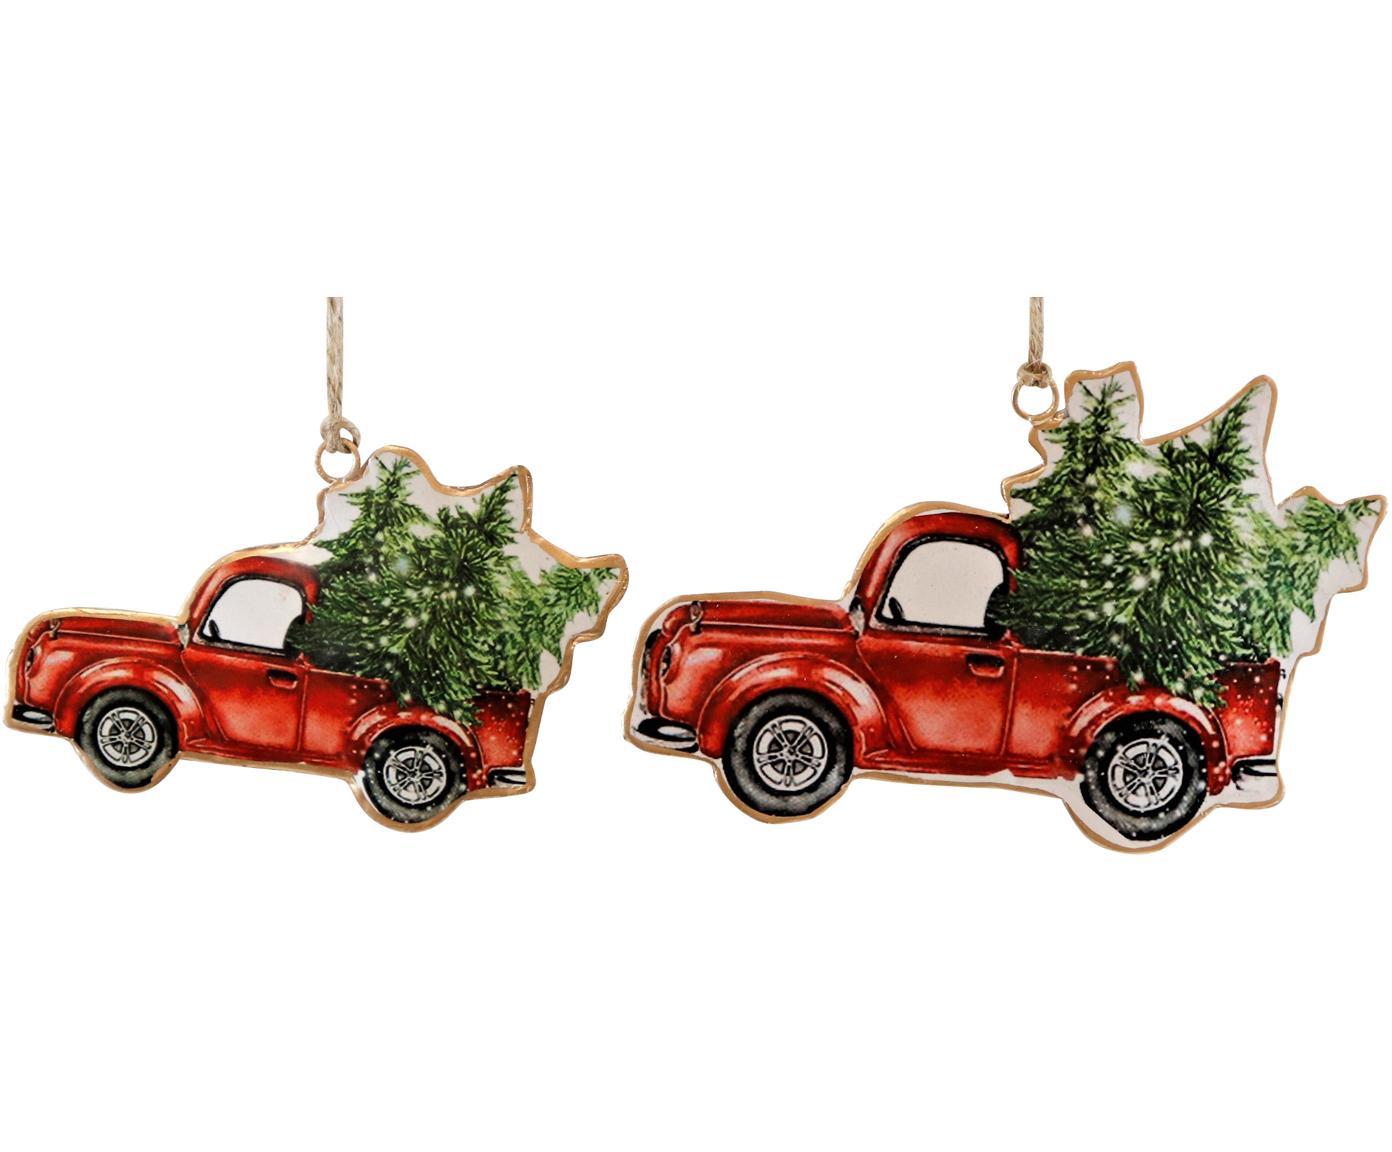 Set de adornos navideños Cars, 2pzas., Metal, Rojo, verde, Set de diferentes tamaños